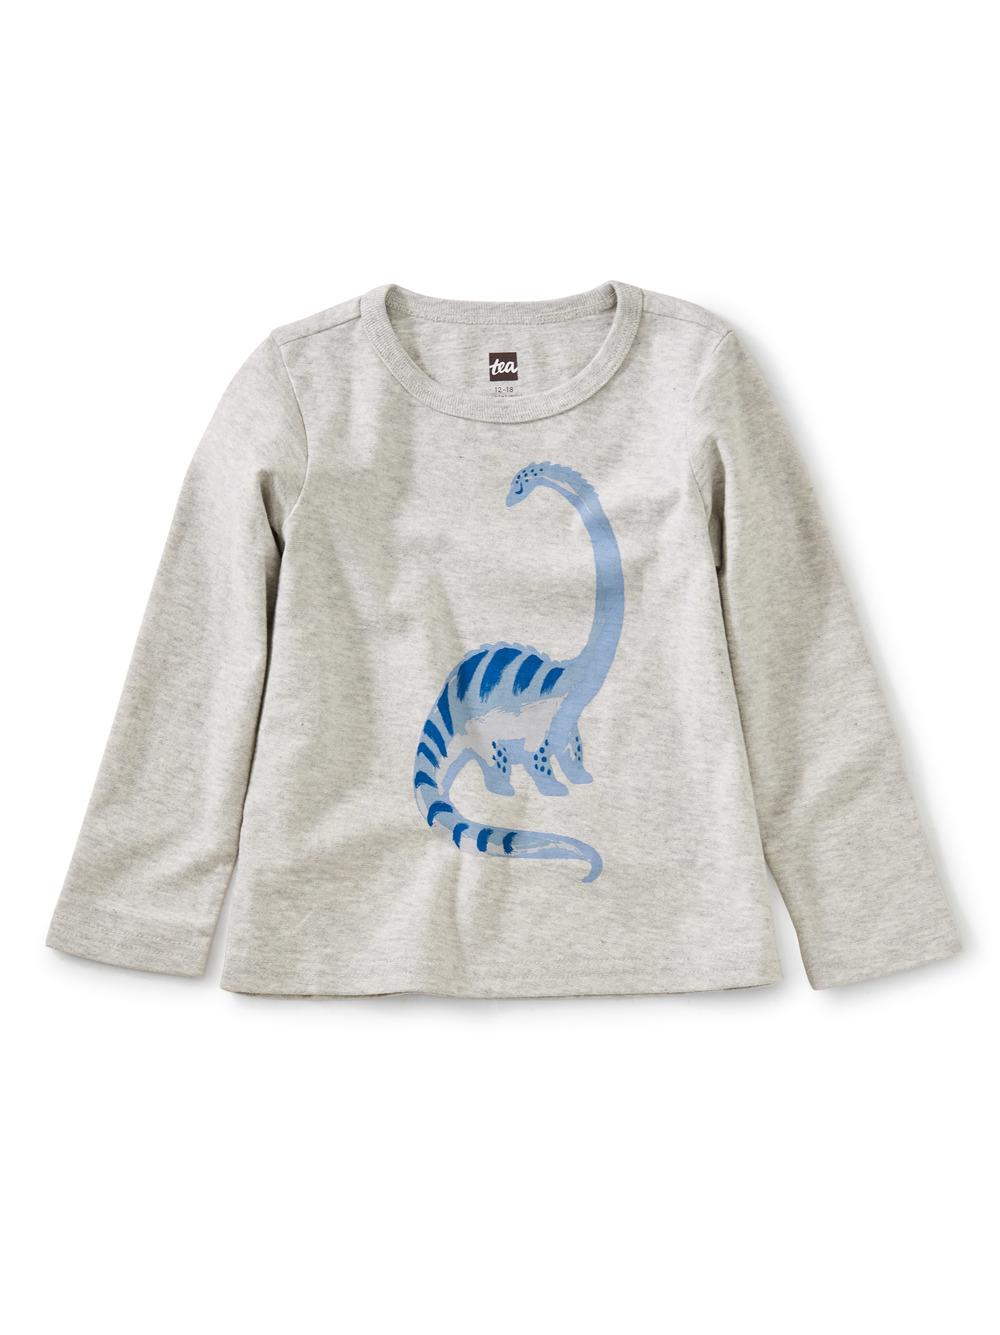 Longneck Dino Graphic Baby Tee